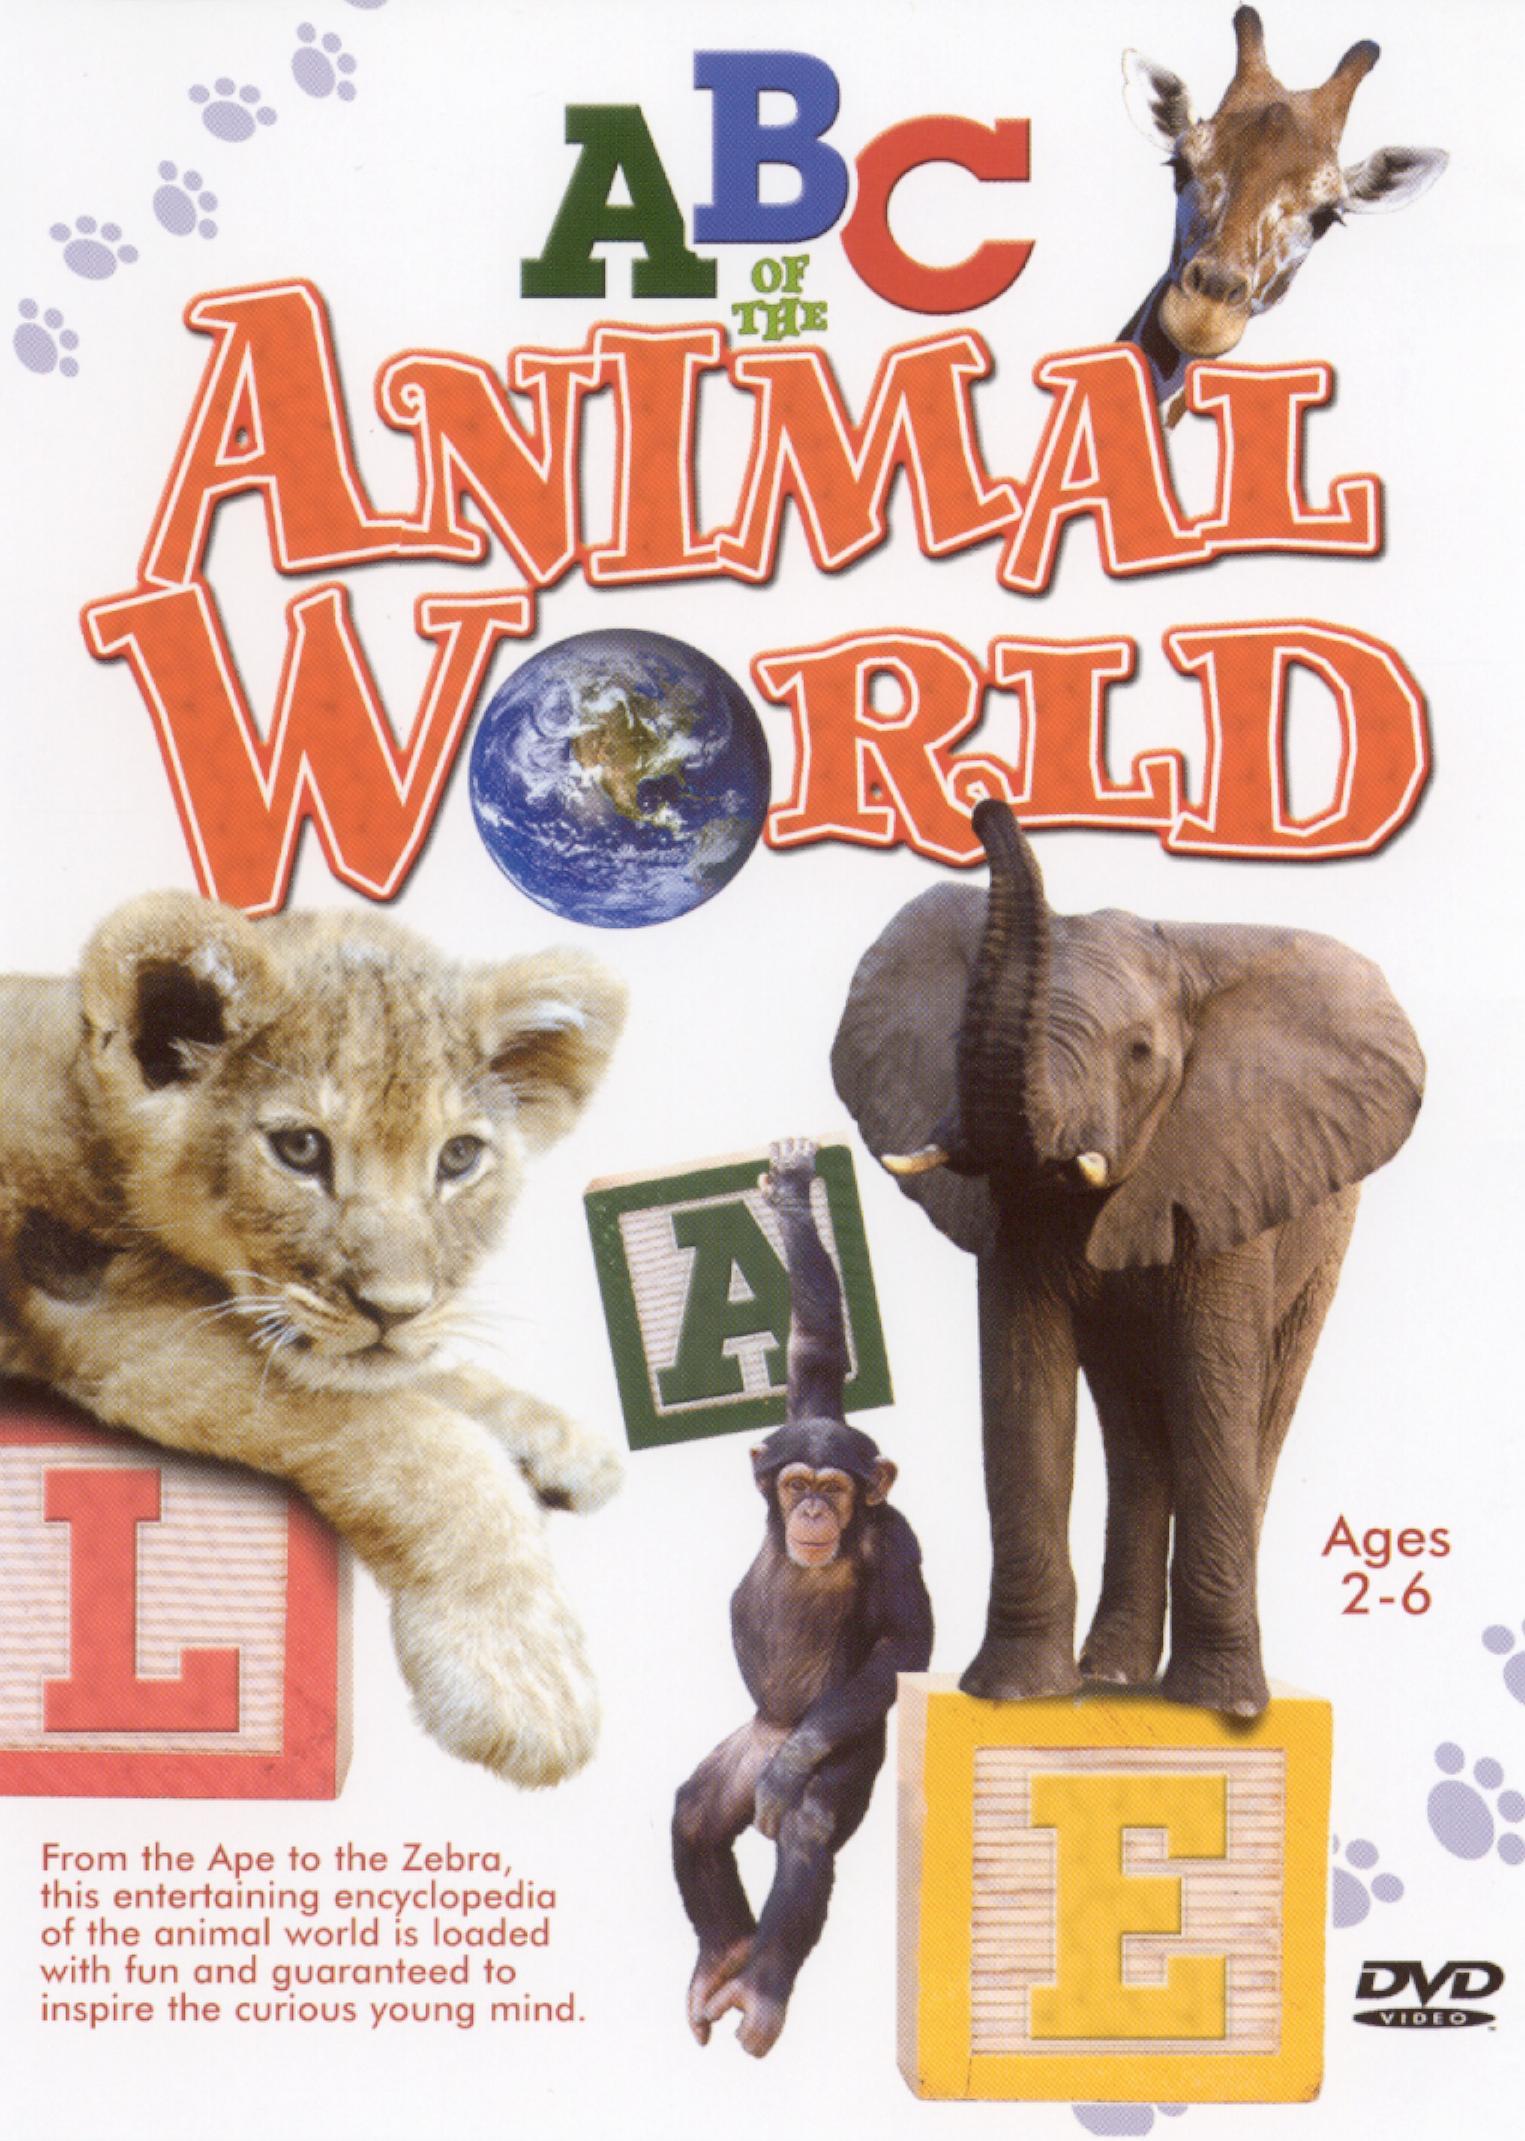 ABC of the Animal World